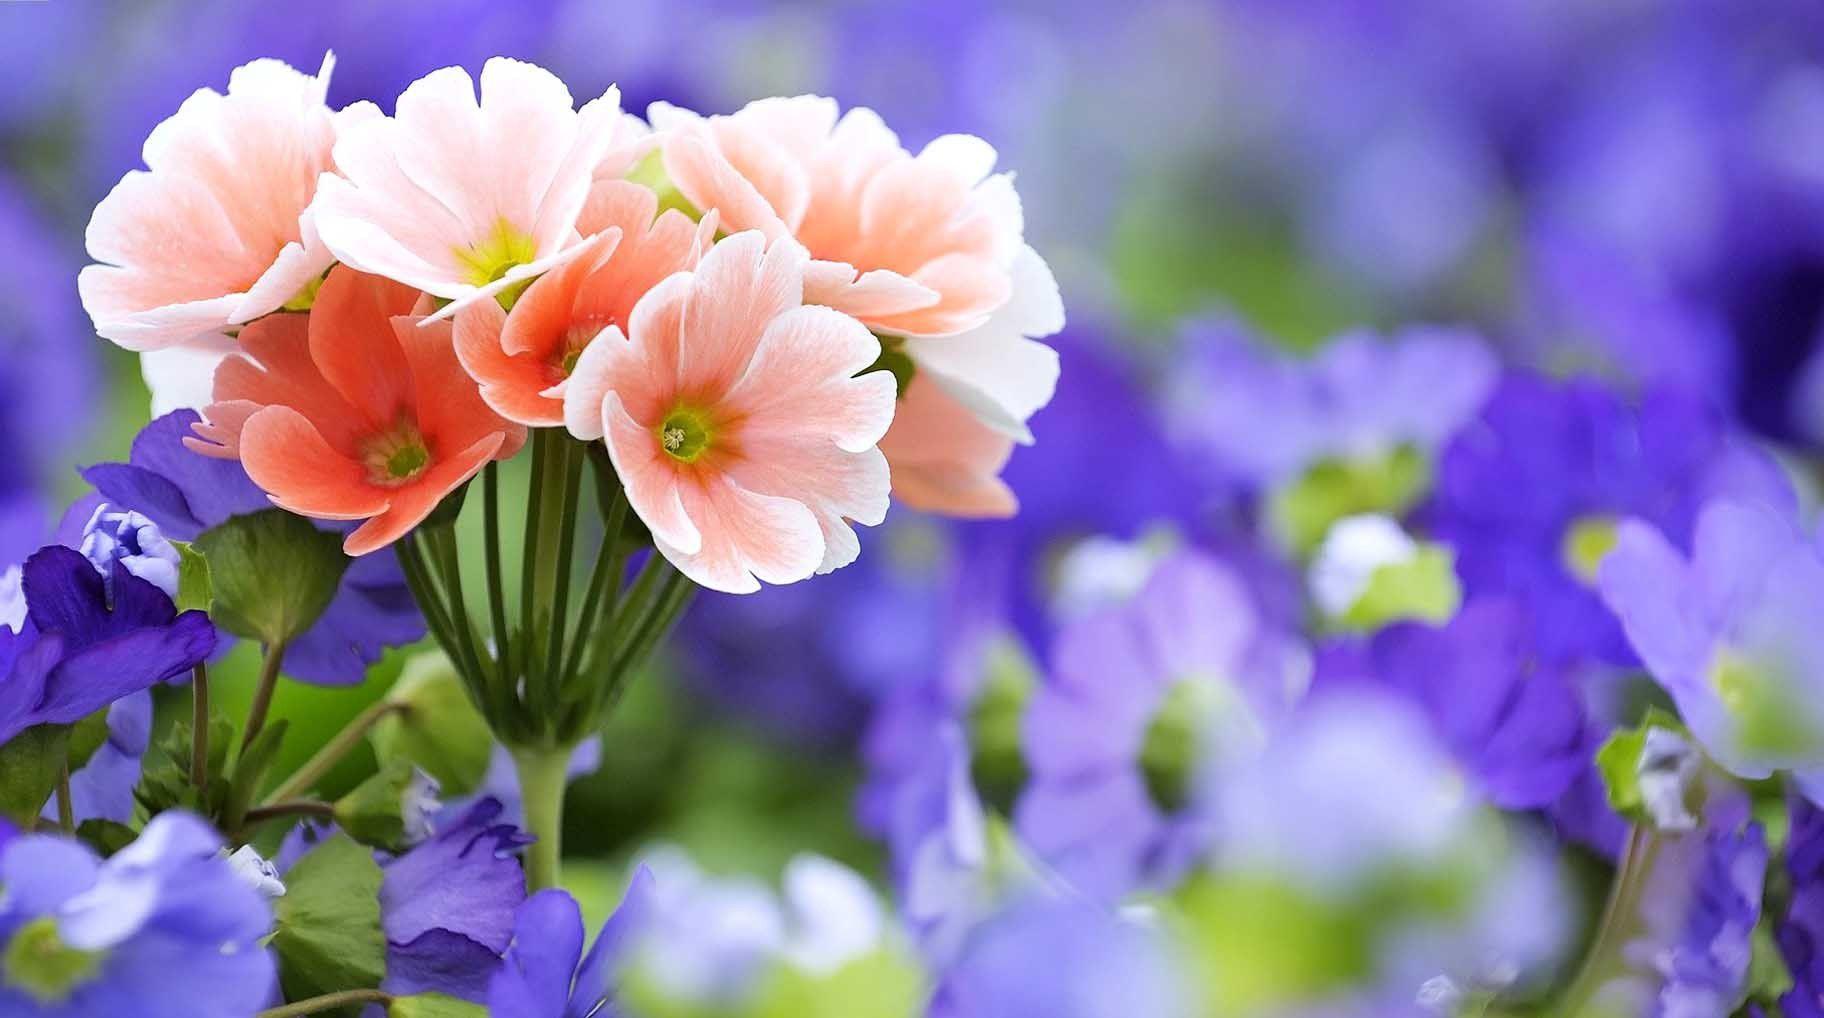 Flower Wallpaper Free Download For Mobile | Flower Wallpaper in 2019 | Beautiful flowers ...